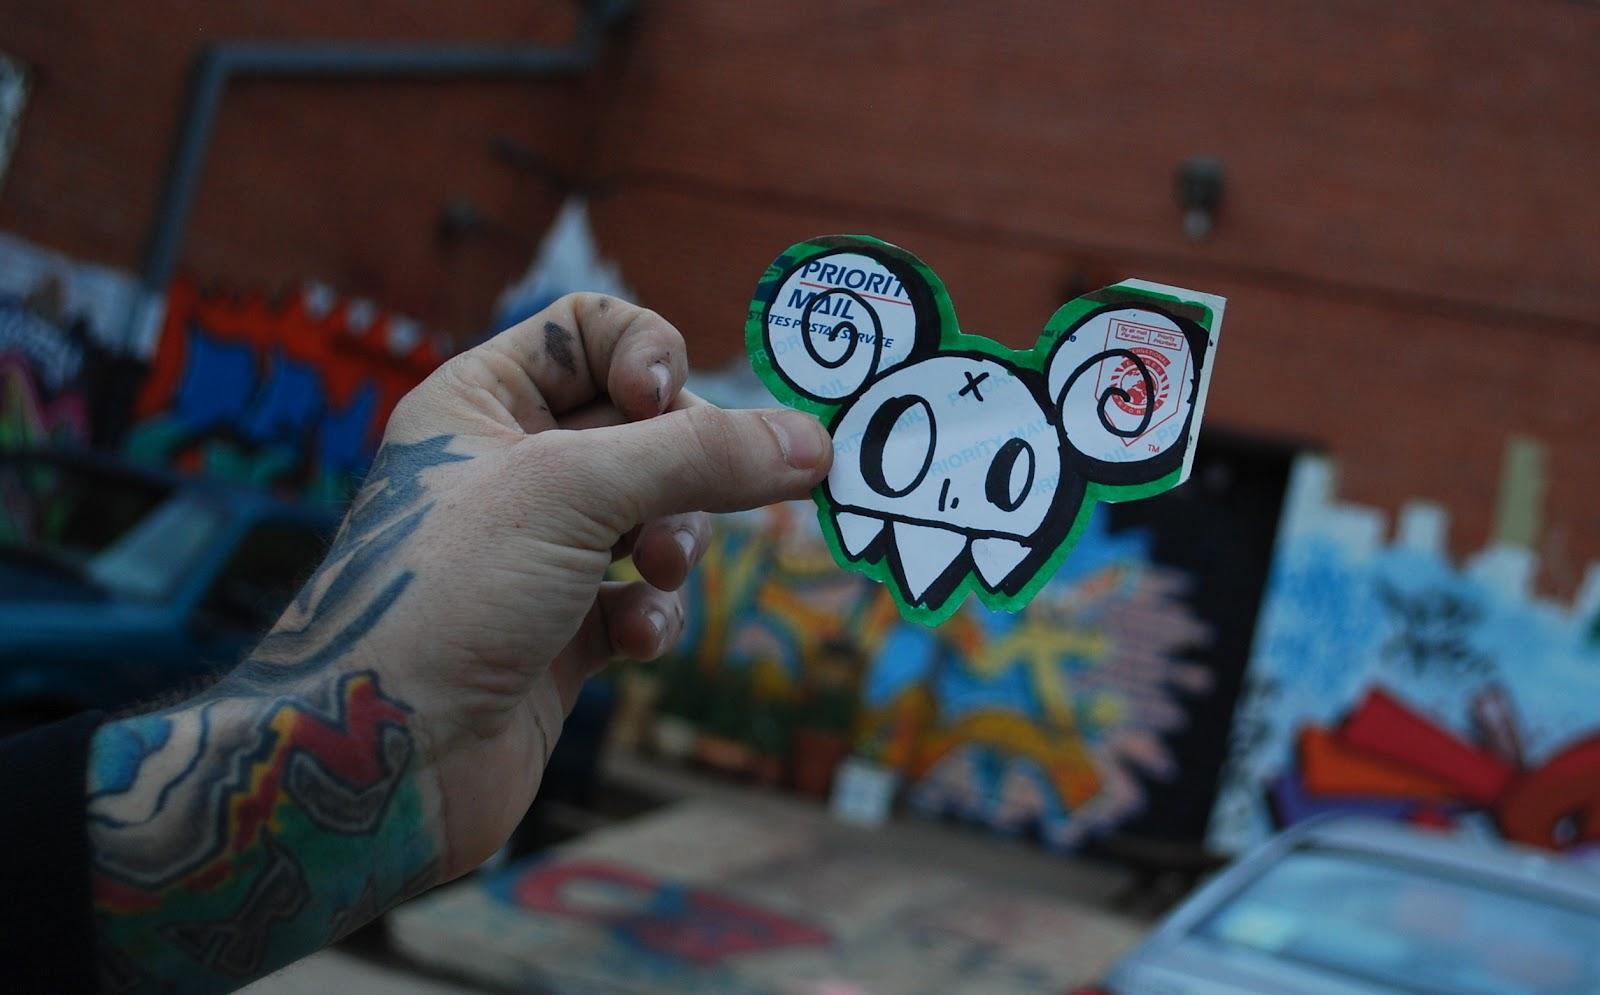 Priority Mail Sticker Graffiti Graffiti Artist: &quot...